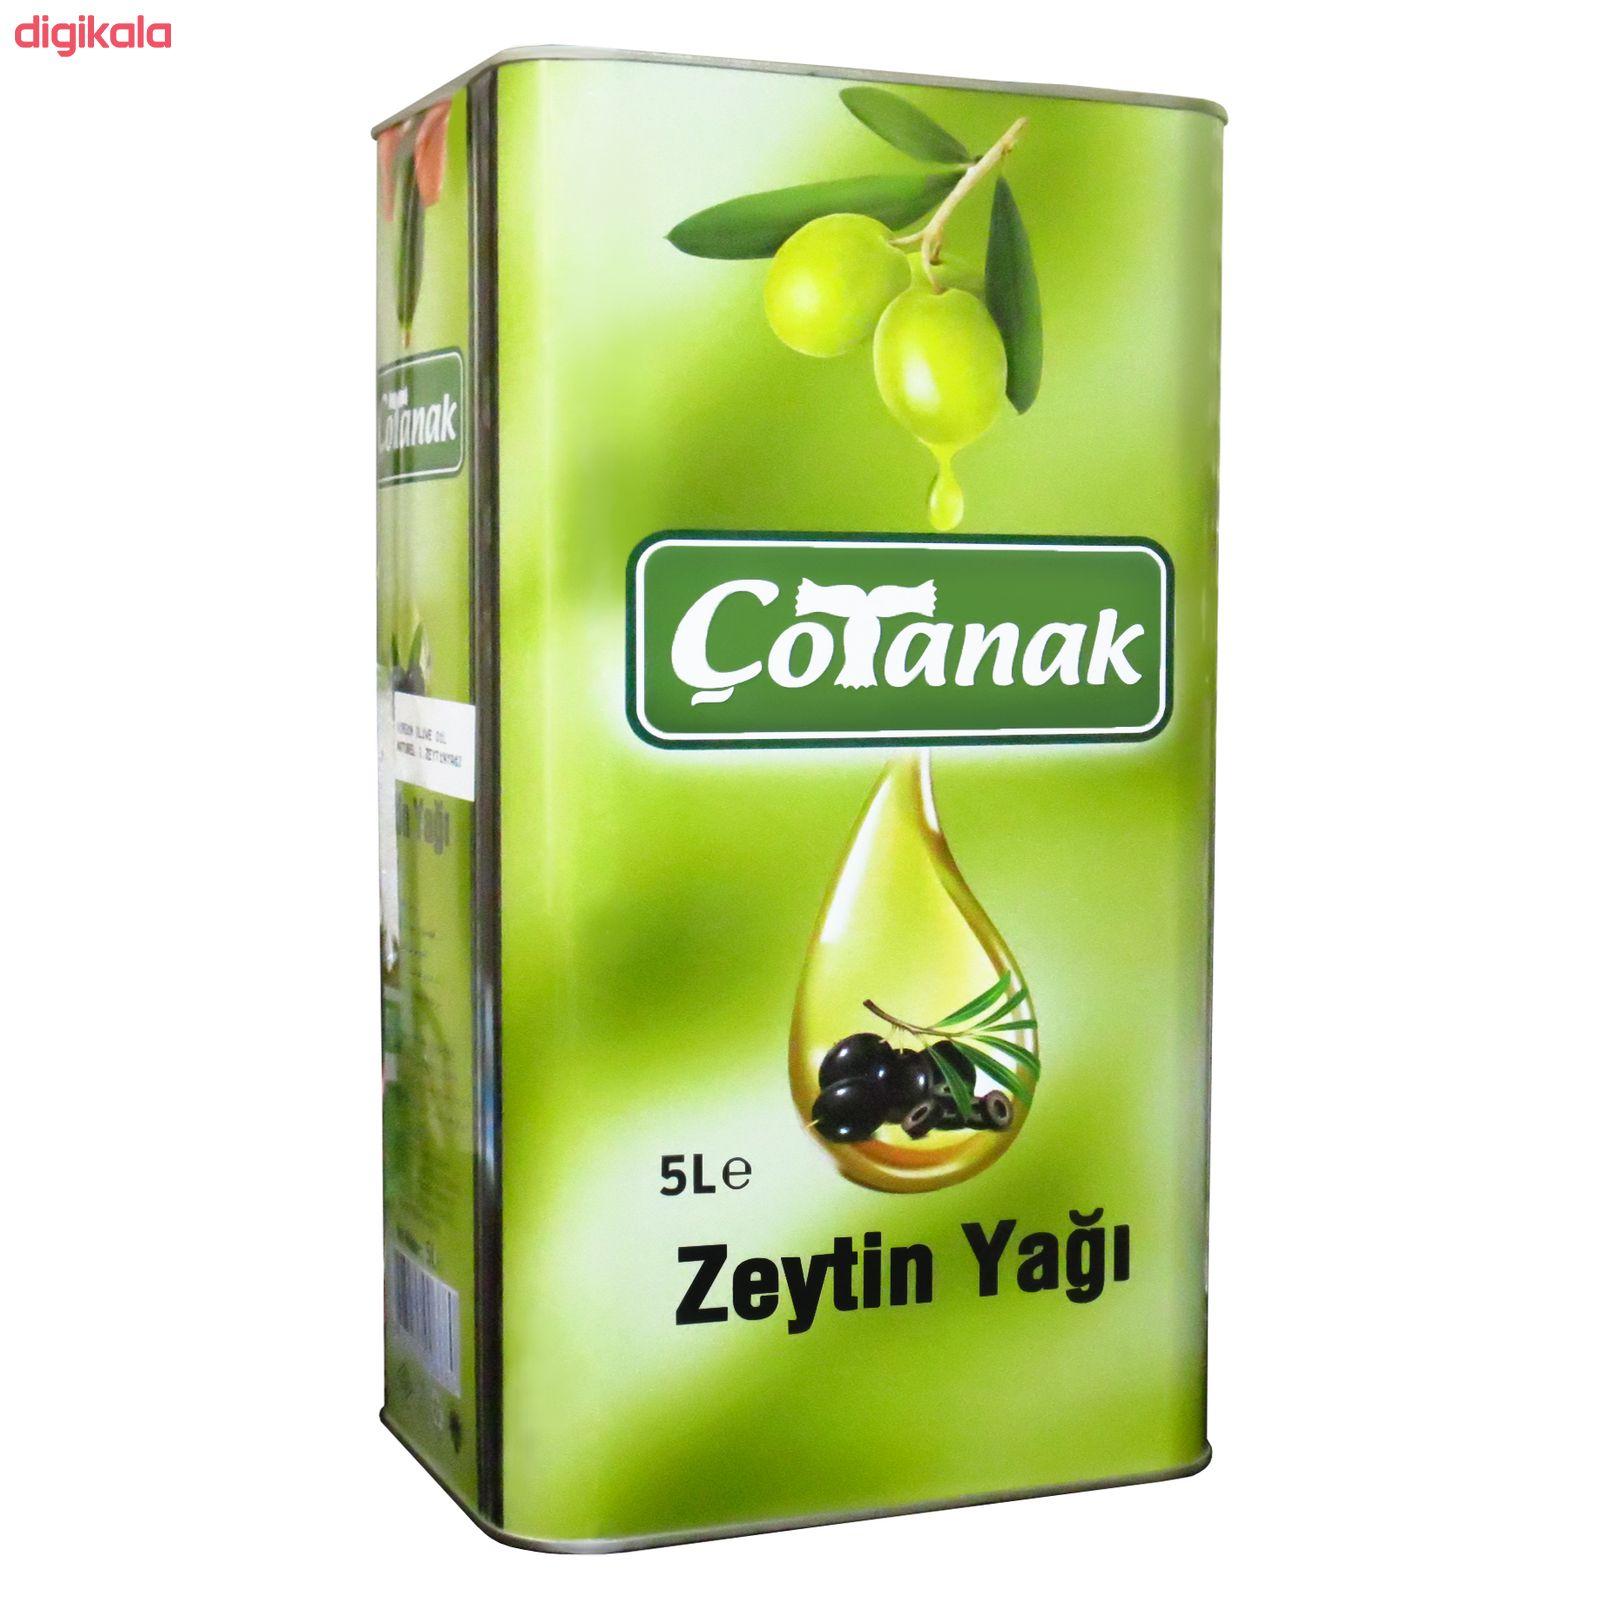 روغن زیتون  بکر چوتاناک - 5 لیتر main 1 1